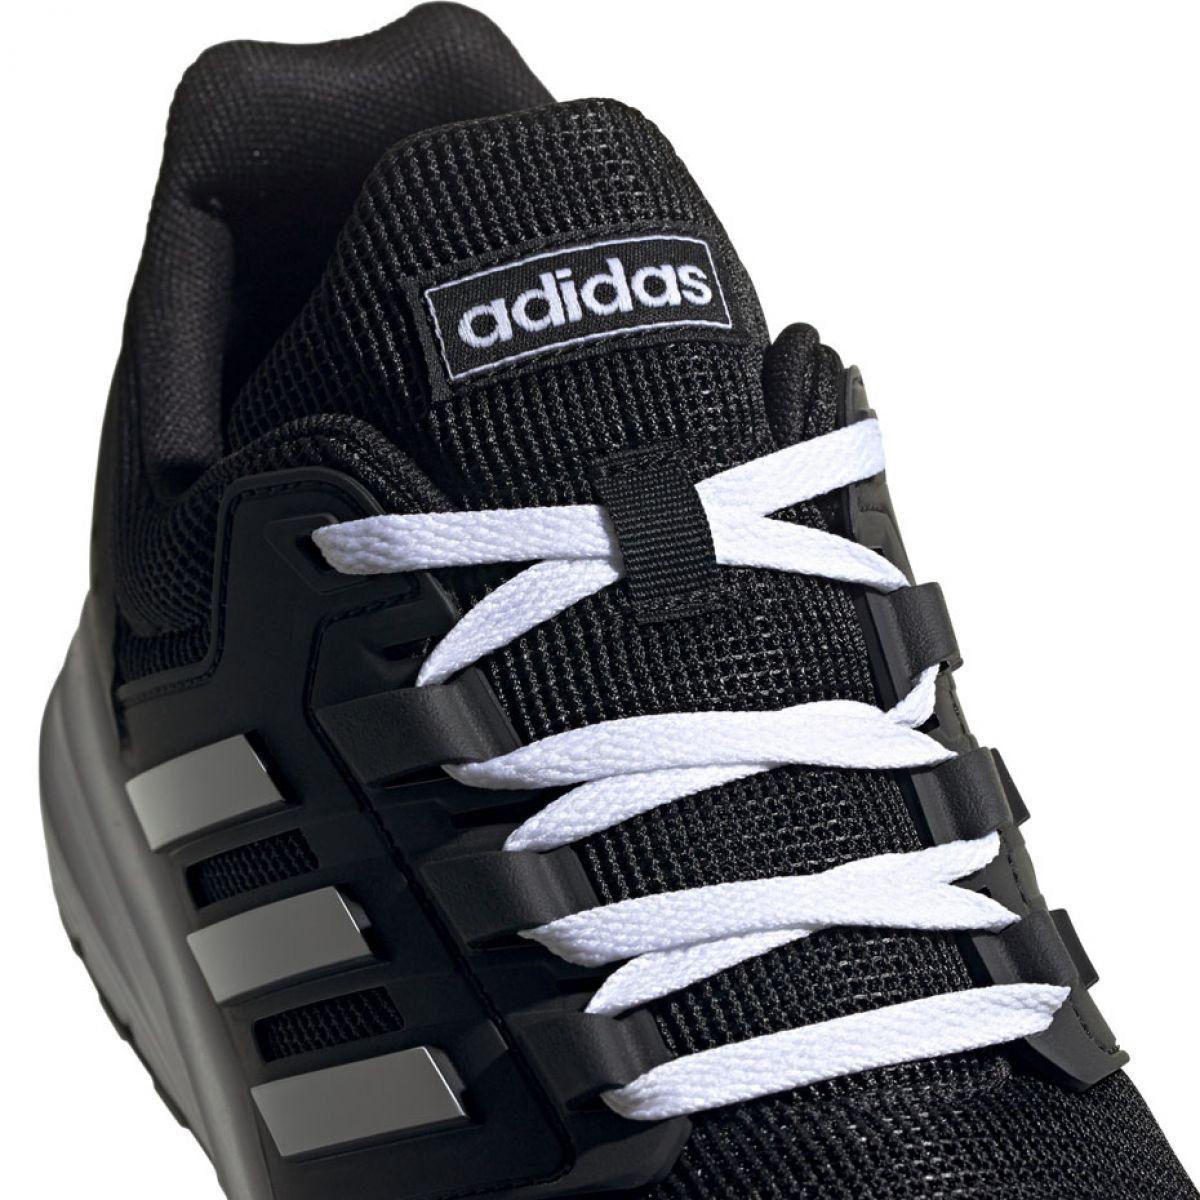 Buty Meskie Do Biegania Adidas Galaxy 4 M Ee8024 Czarne Adidas Samba Sneakers Adidas Sneakers Adidas Samba